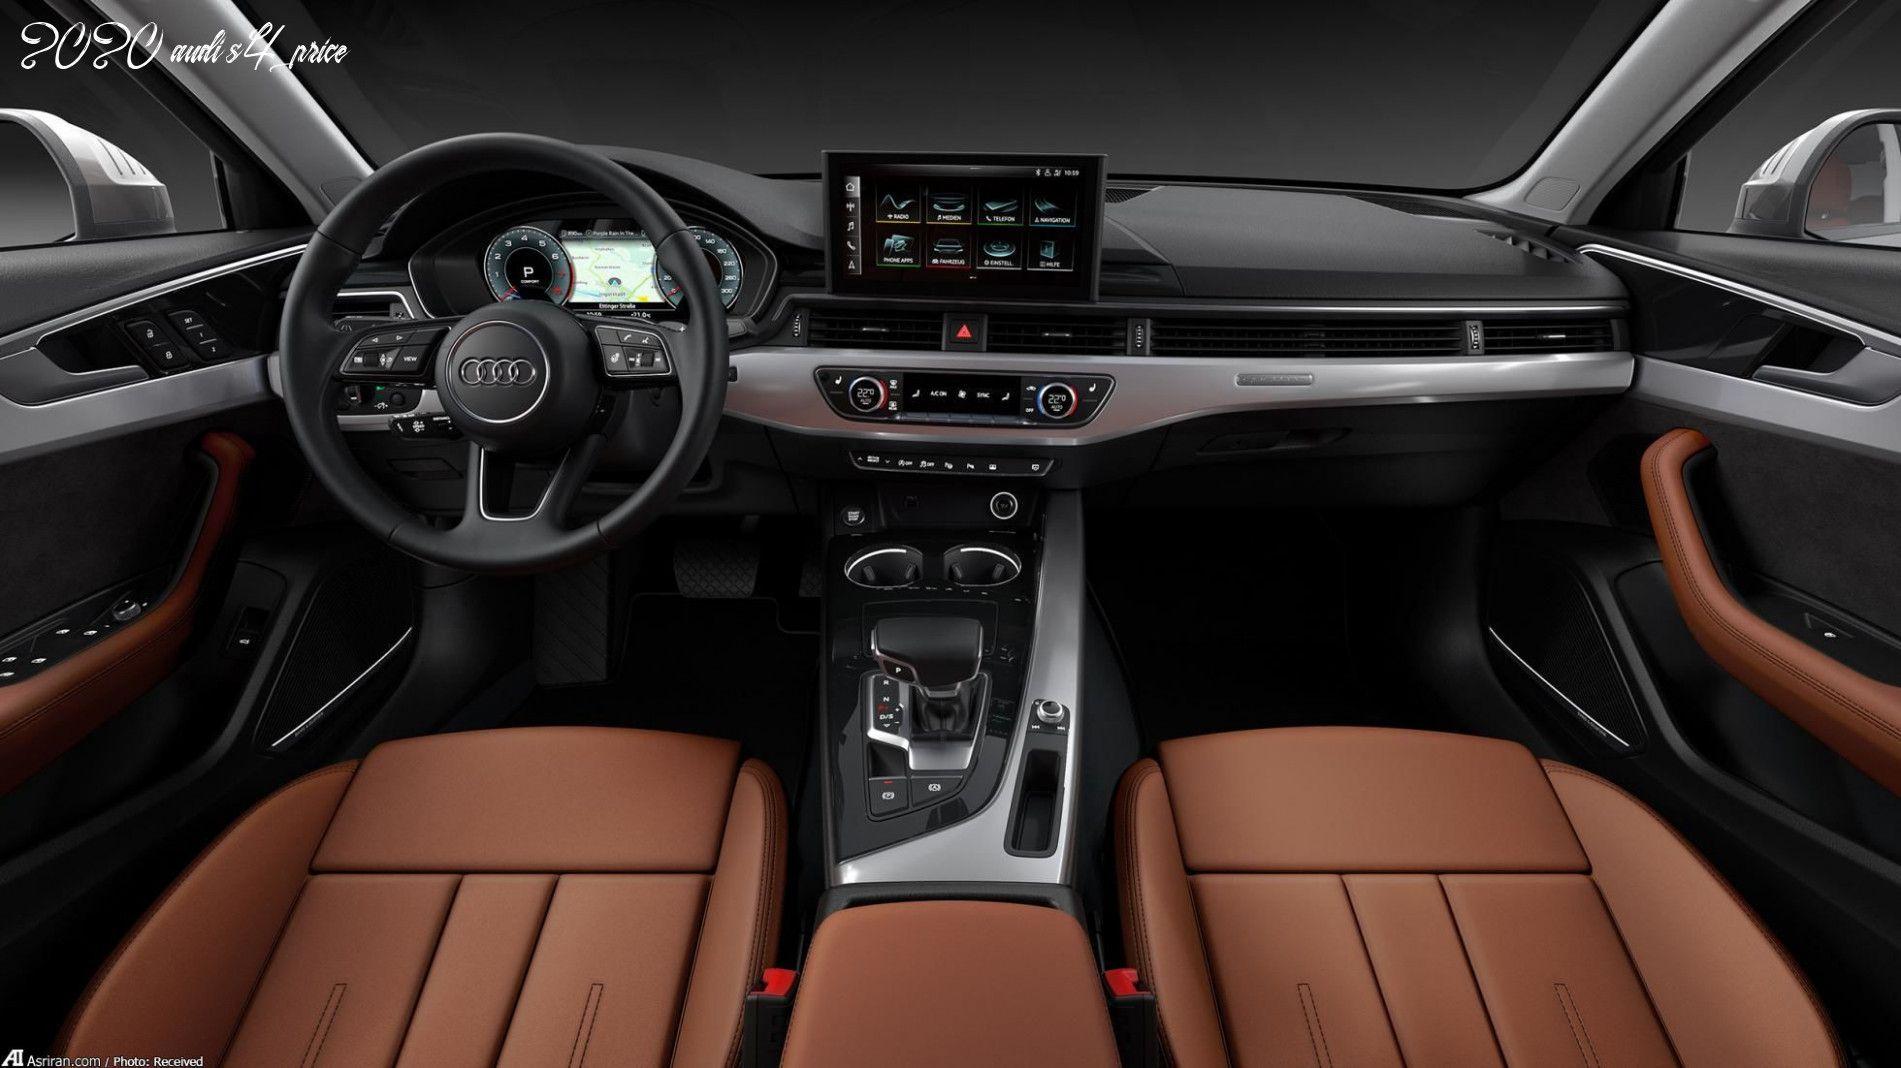 2020 Audi S4 Price 2020audis4avantprice 2020audis4buildandprice 2020audis4leaseprice 2020audis4price 2020audis4pricecanada 2020audis4pr In 2020 Audi S4 Audi Tdi